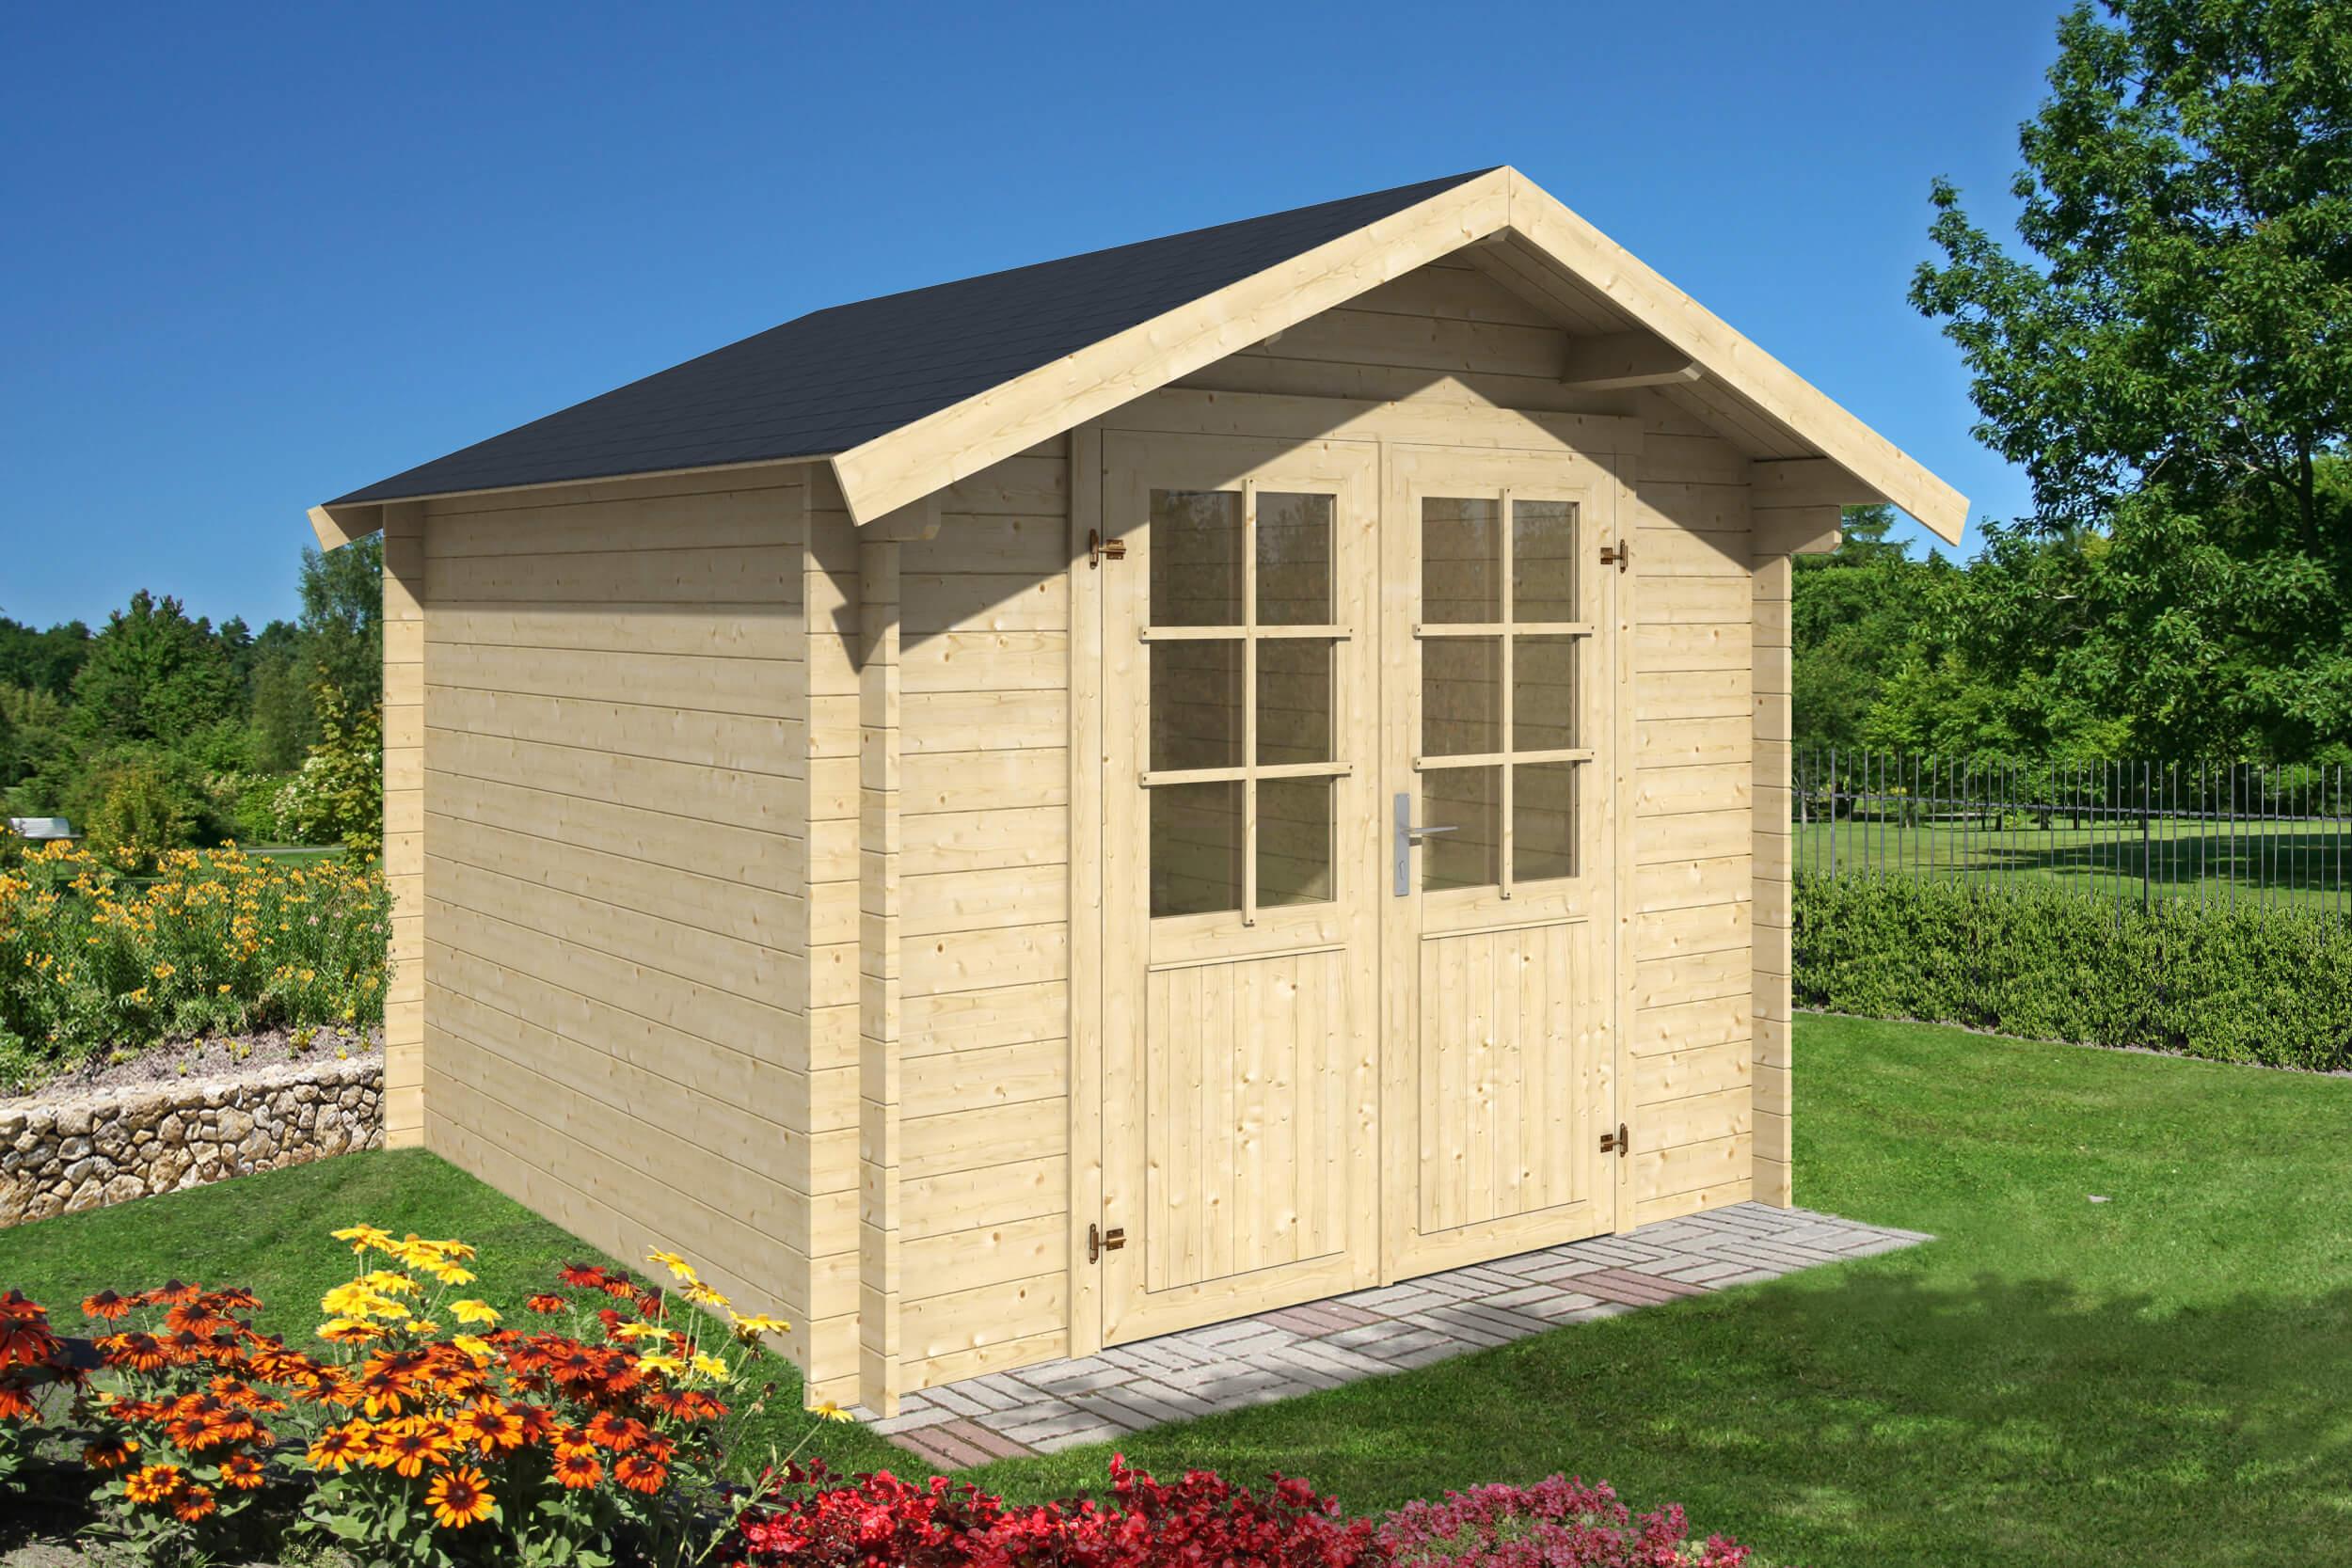 gartenhaus ida 28 mm ca 300x300 cm holzwurm obersayn. Black Bedroom Furniture Sets. Home Design Ideas